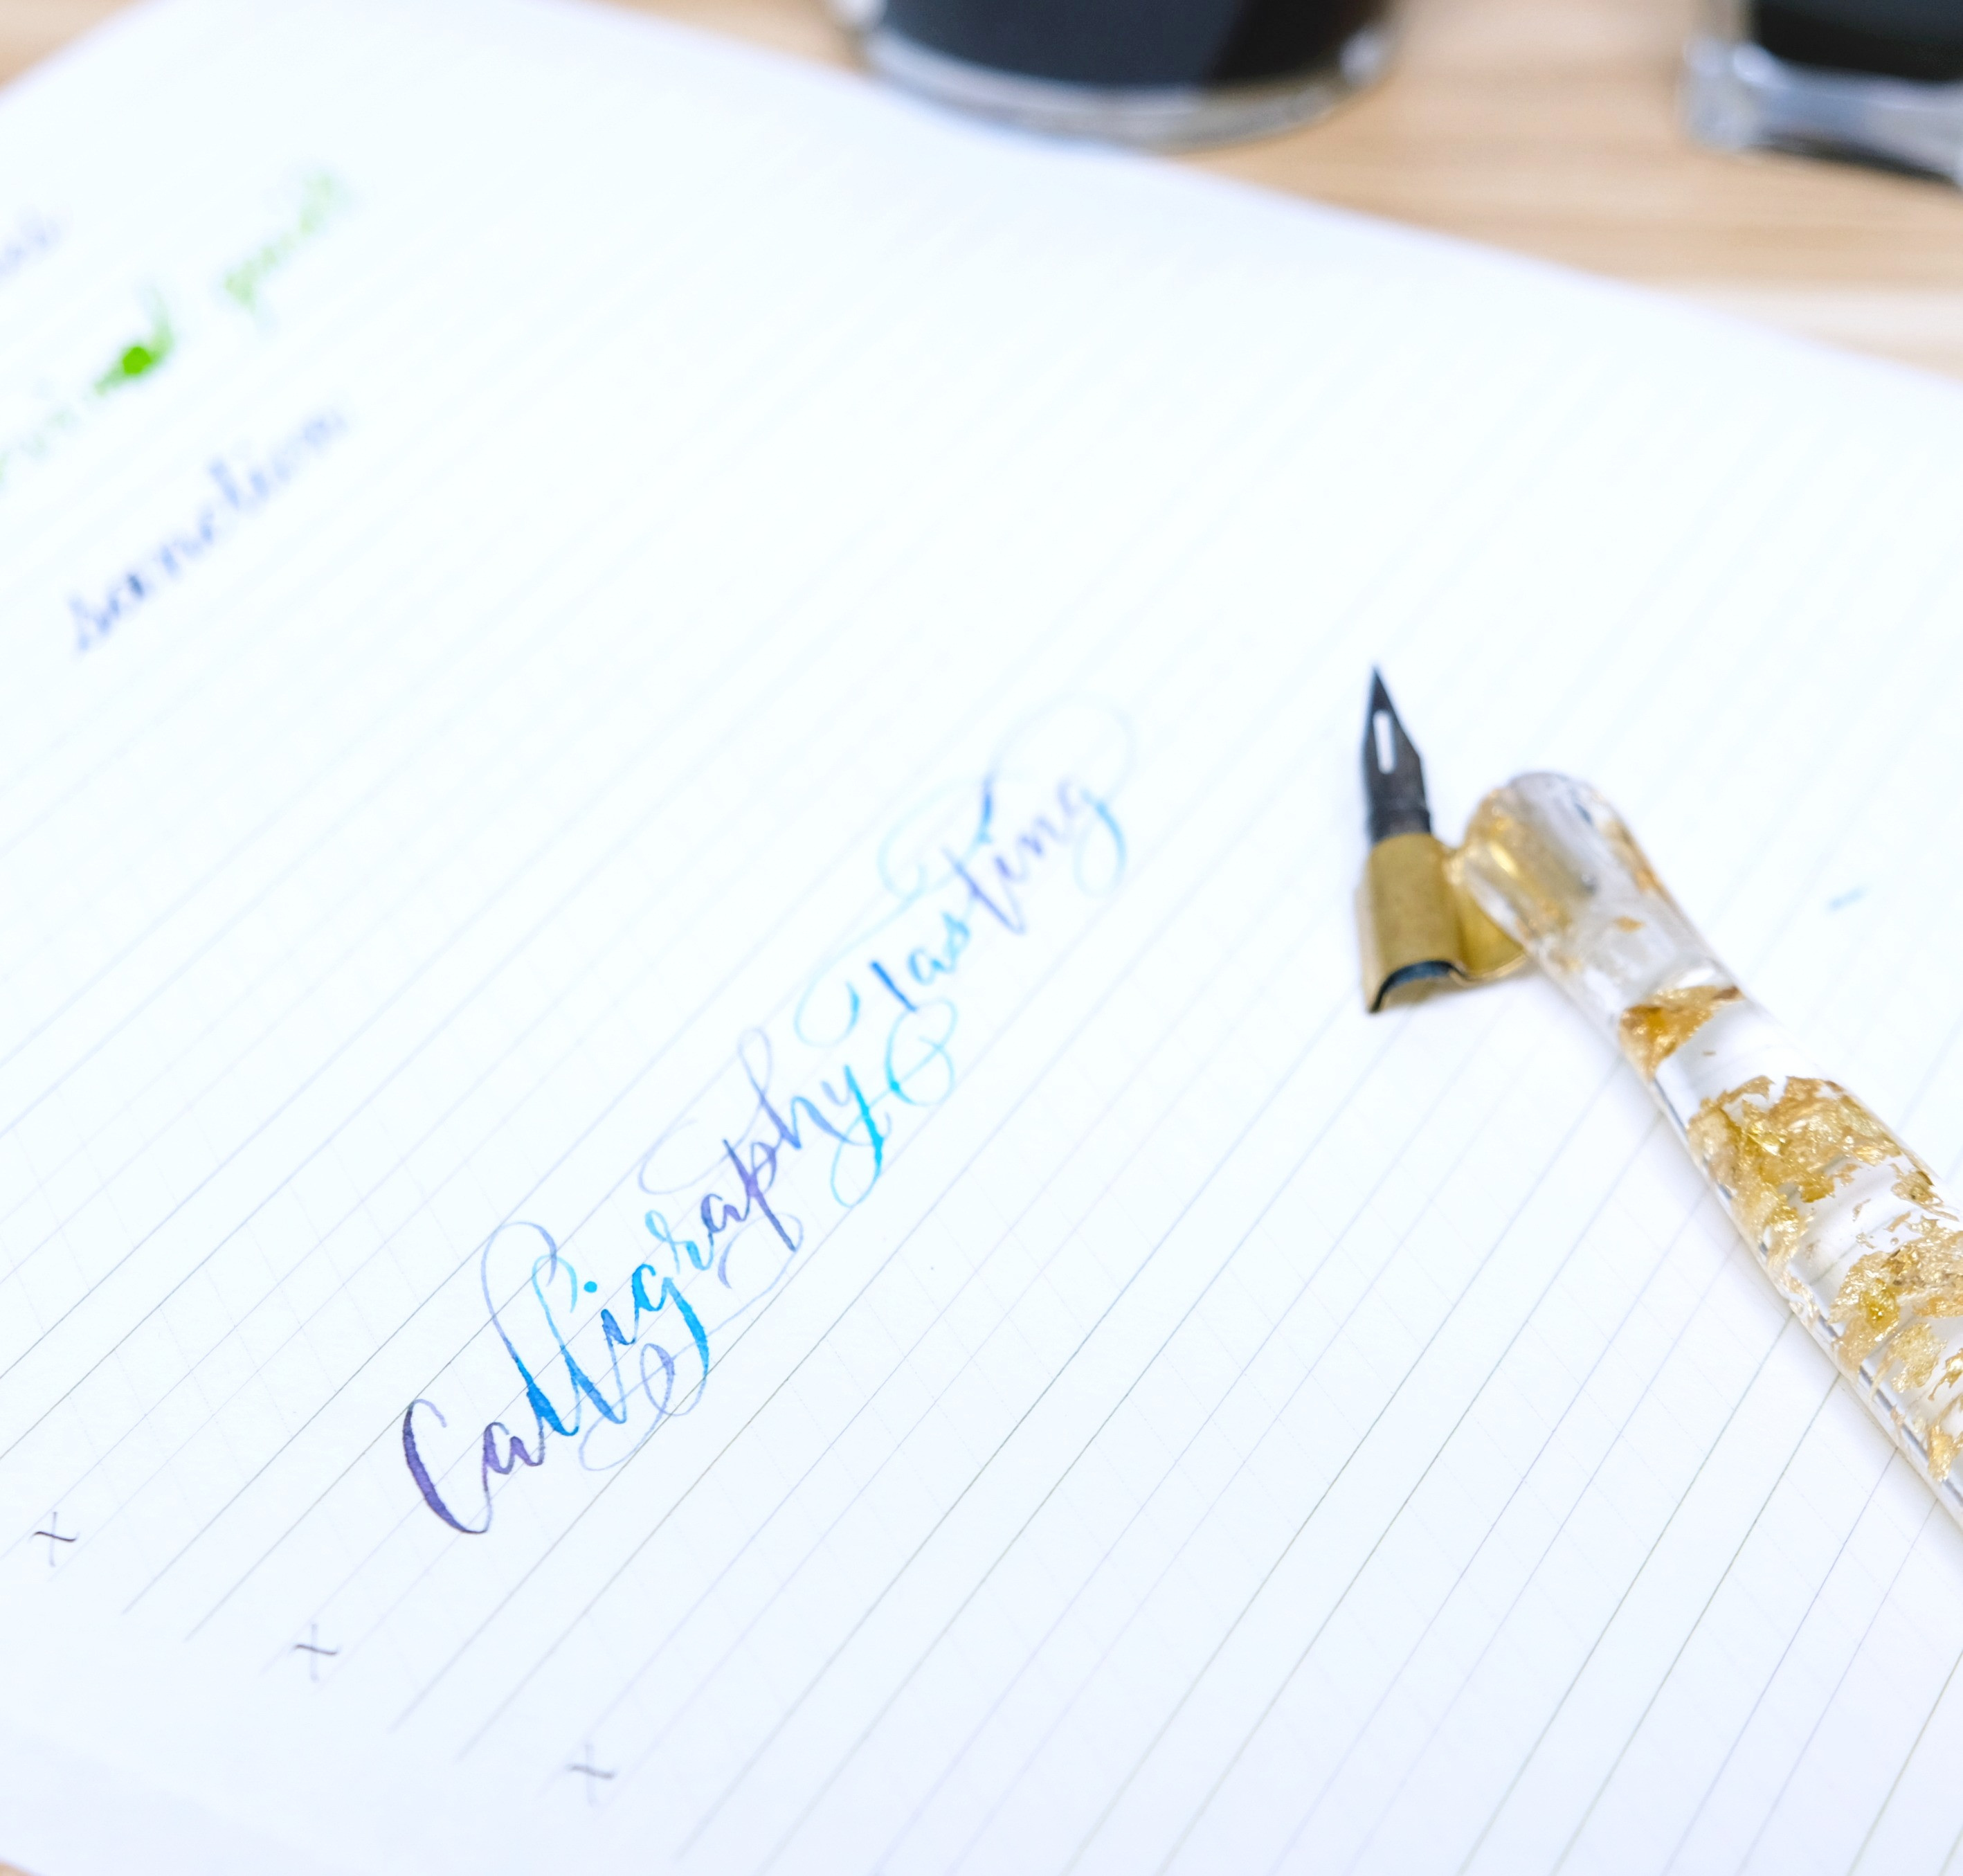 Calligraphy Tasting Workshop